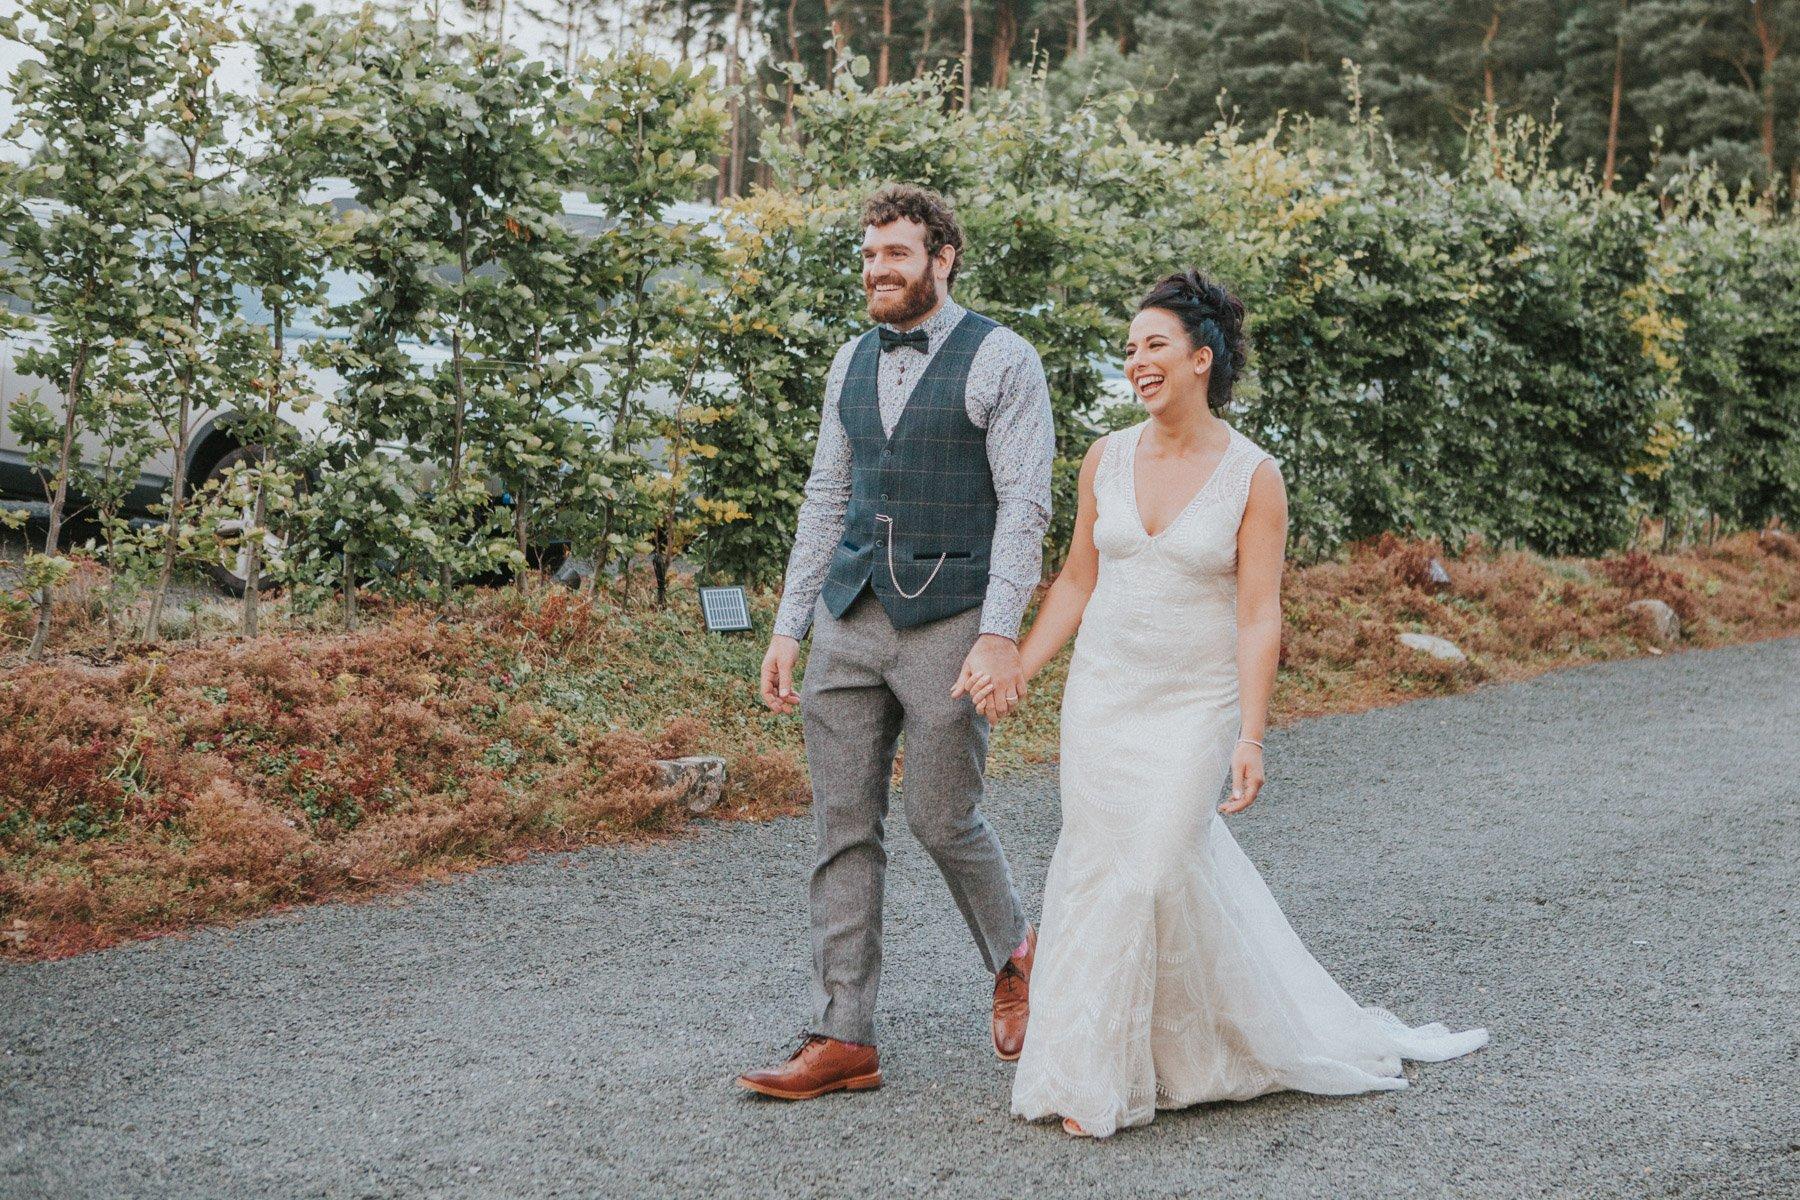 Healey Barn Wedding - Couple portraits in the courtyard